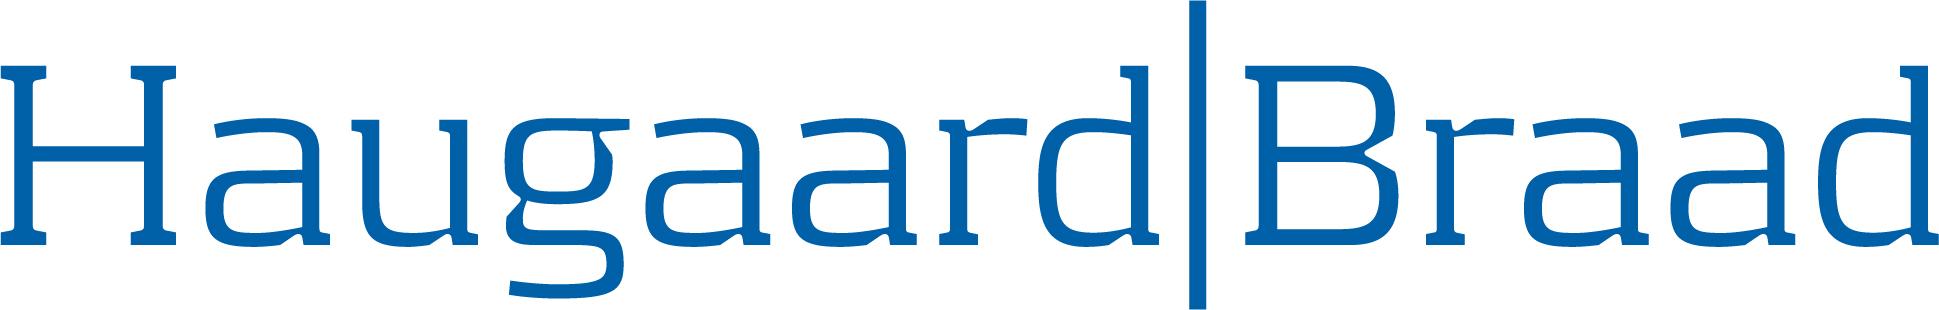 HaugaardBraad-logo-IntenseBlue